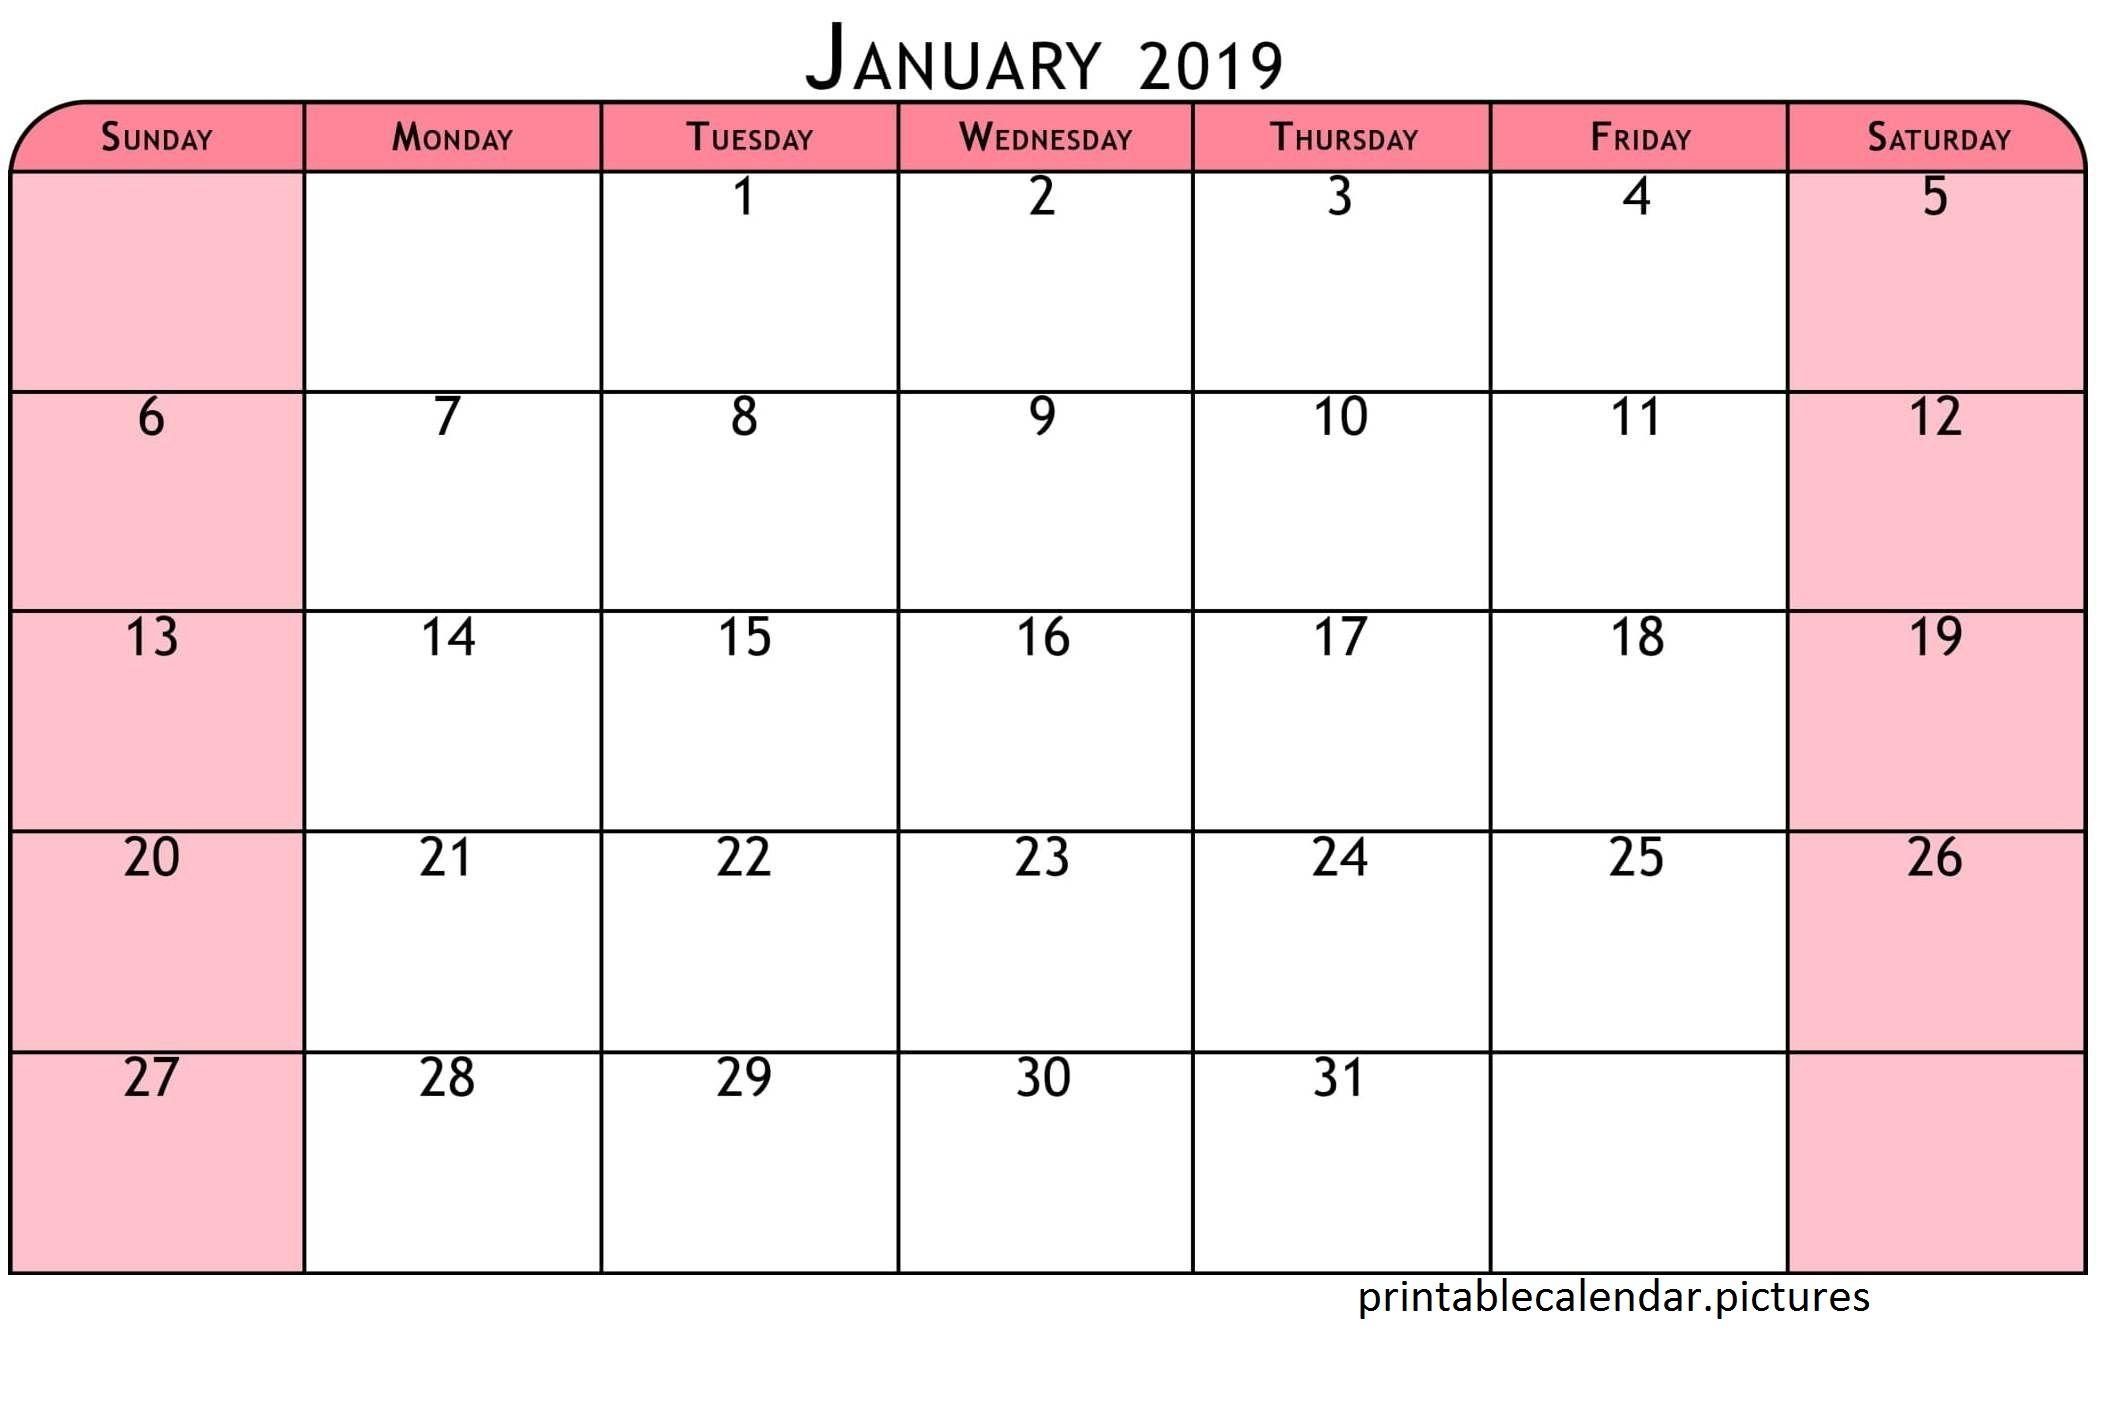 Printable Colorful Calendar January